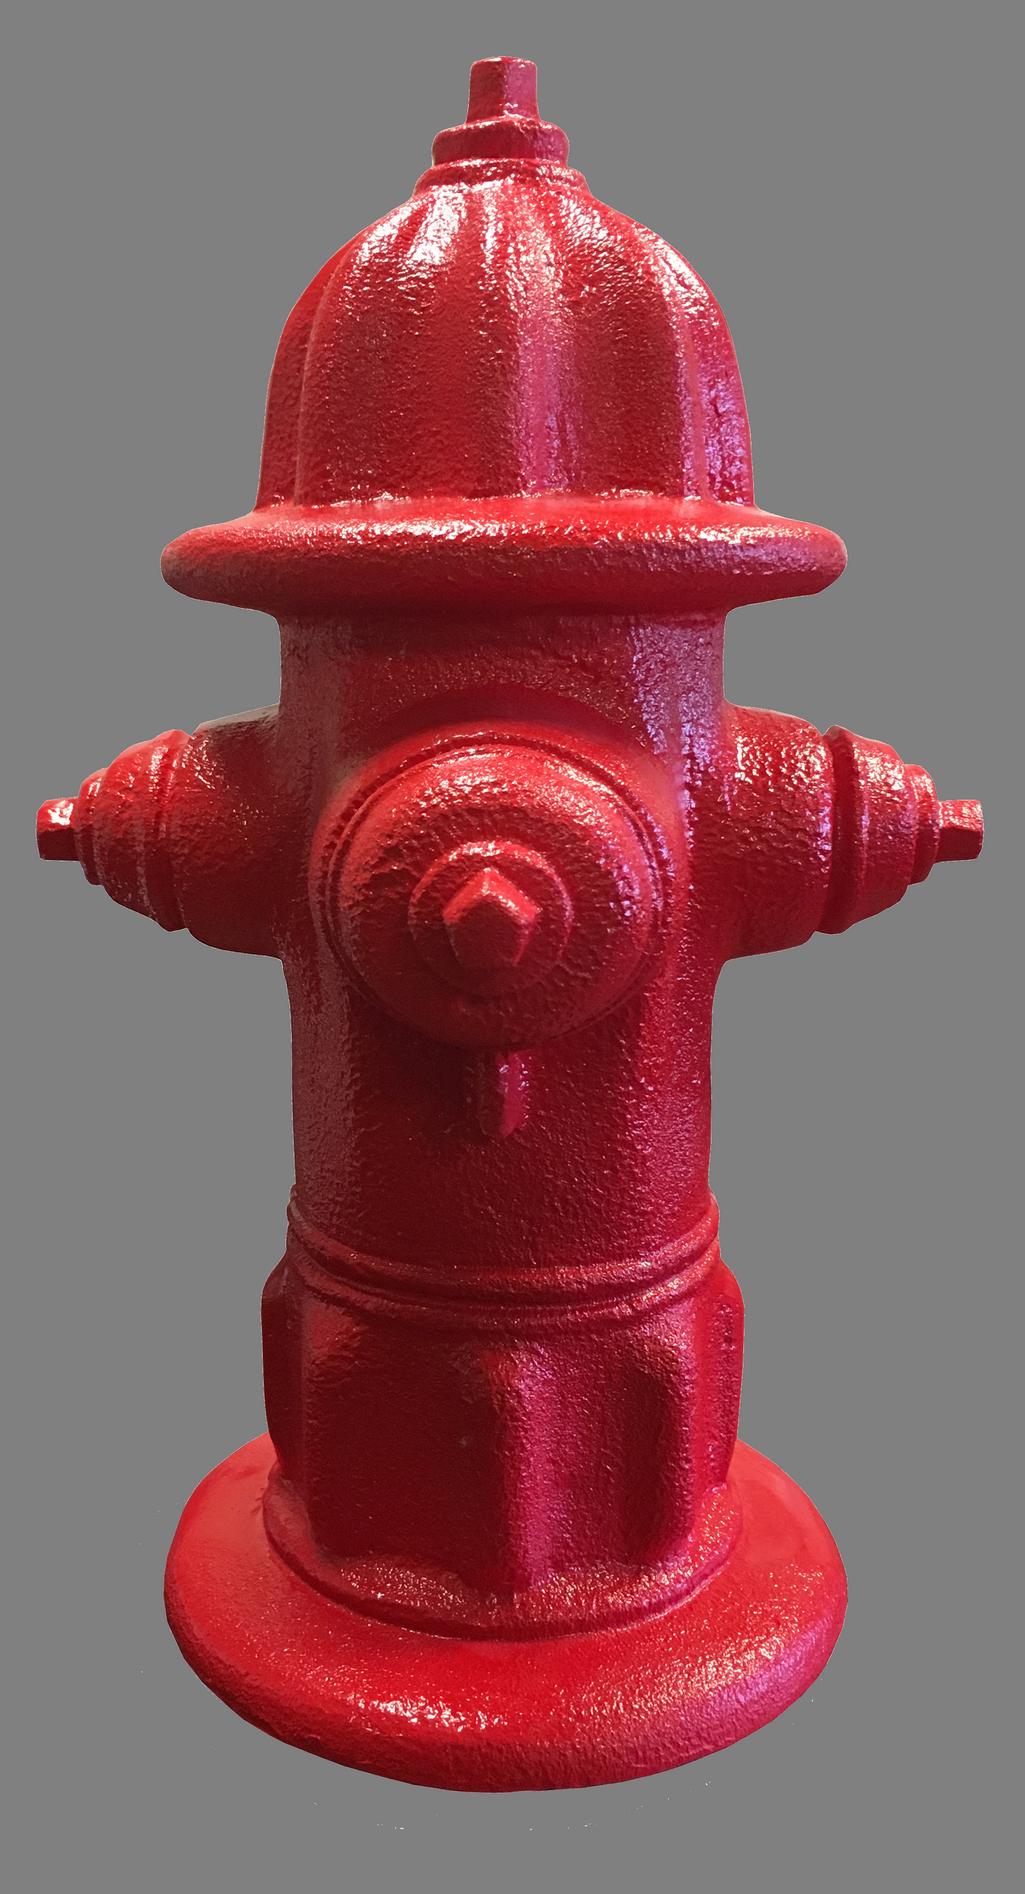 Fire Hydrant Png Image Hydrant Fire Hydrant Fire